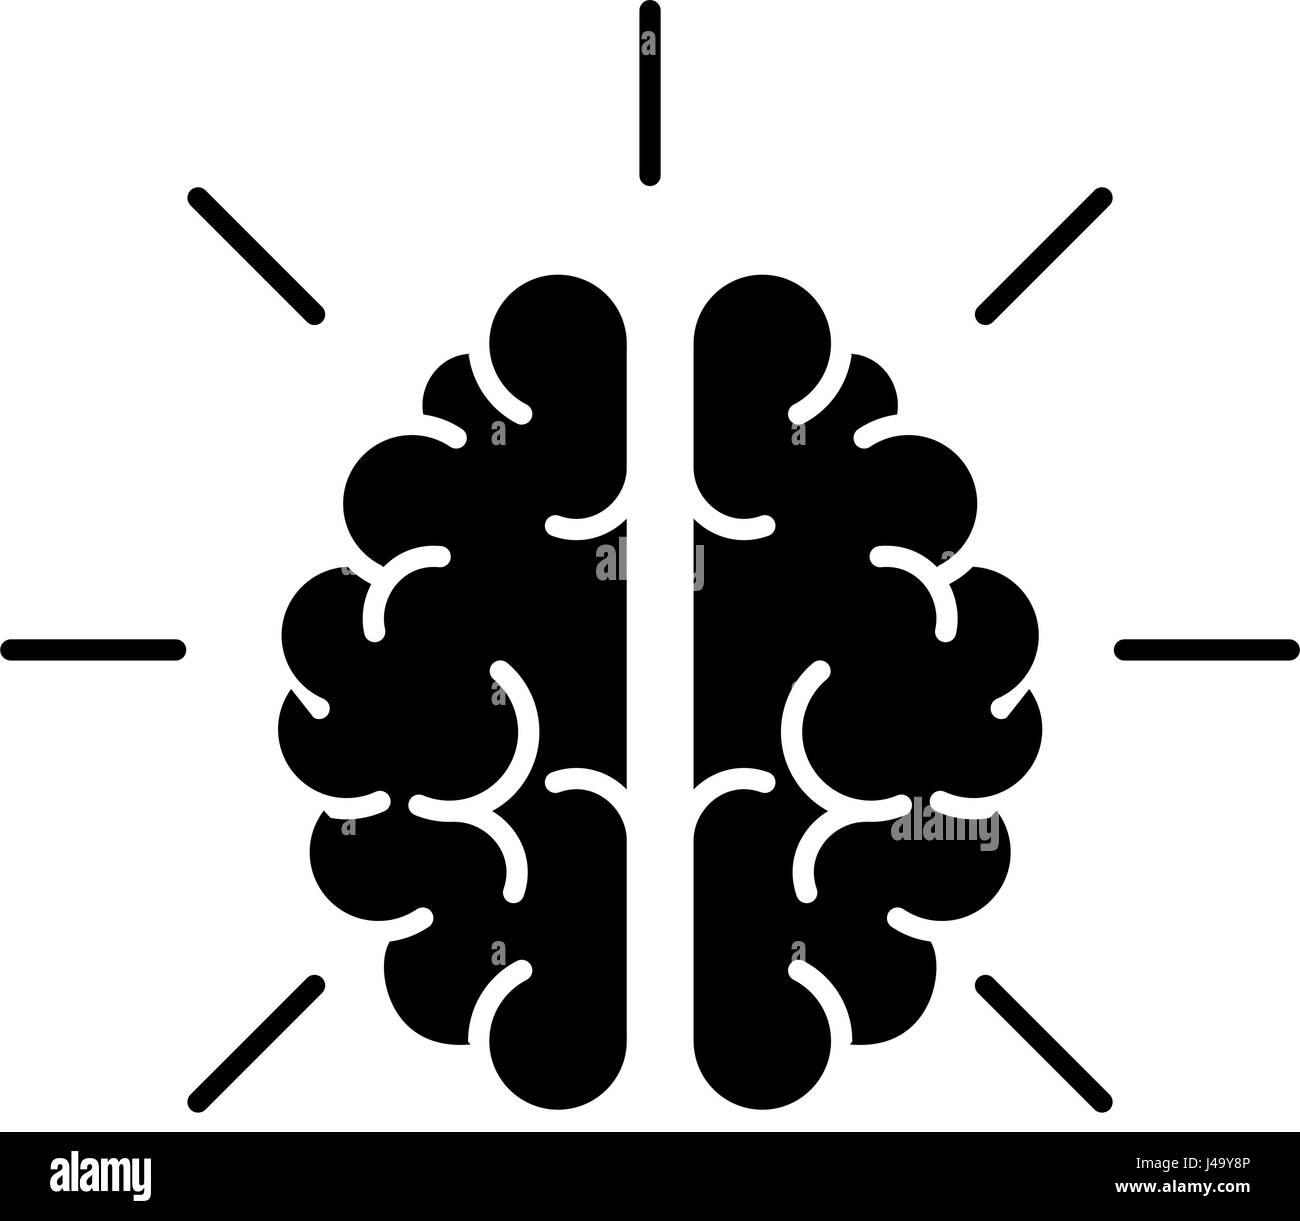 Human brain symbol - Stock Image